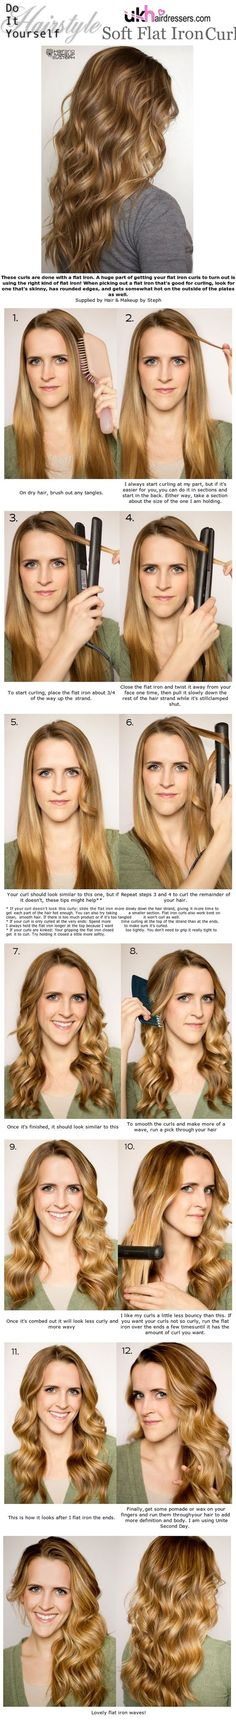 soft-flat-iron-curls via